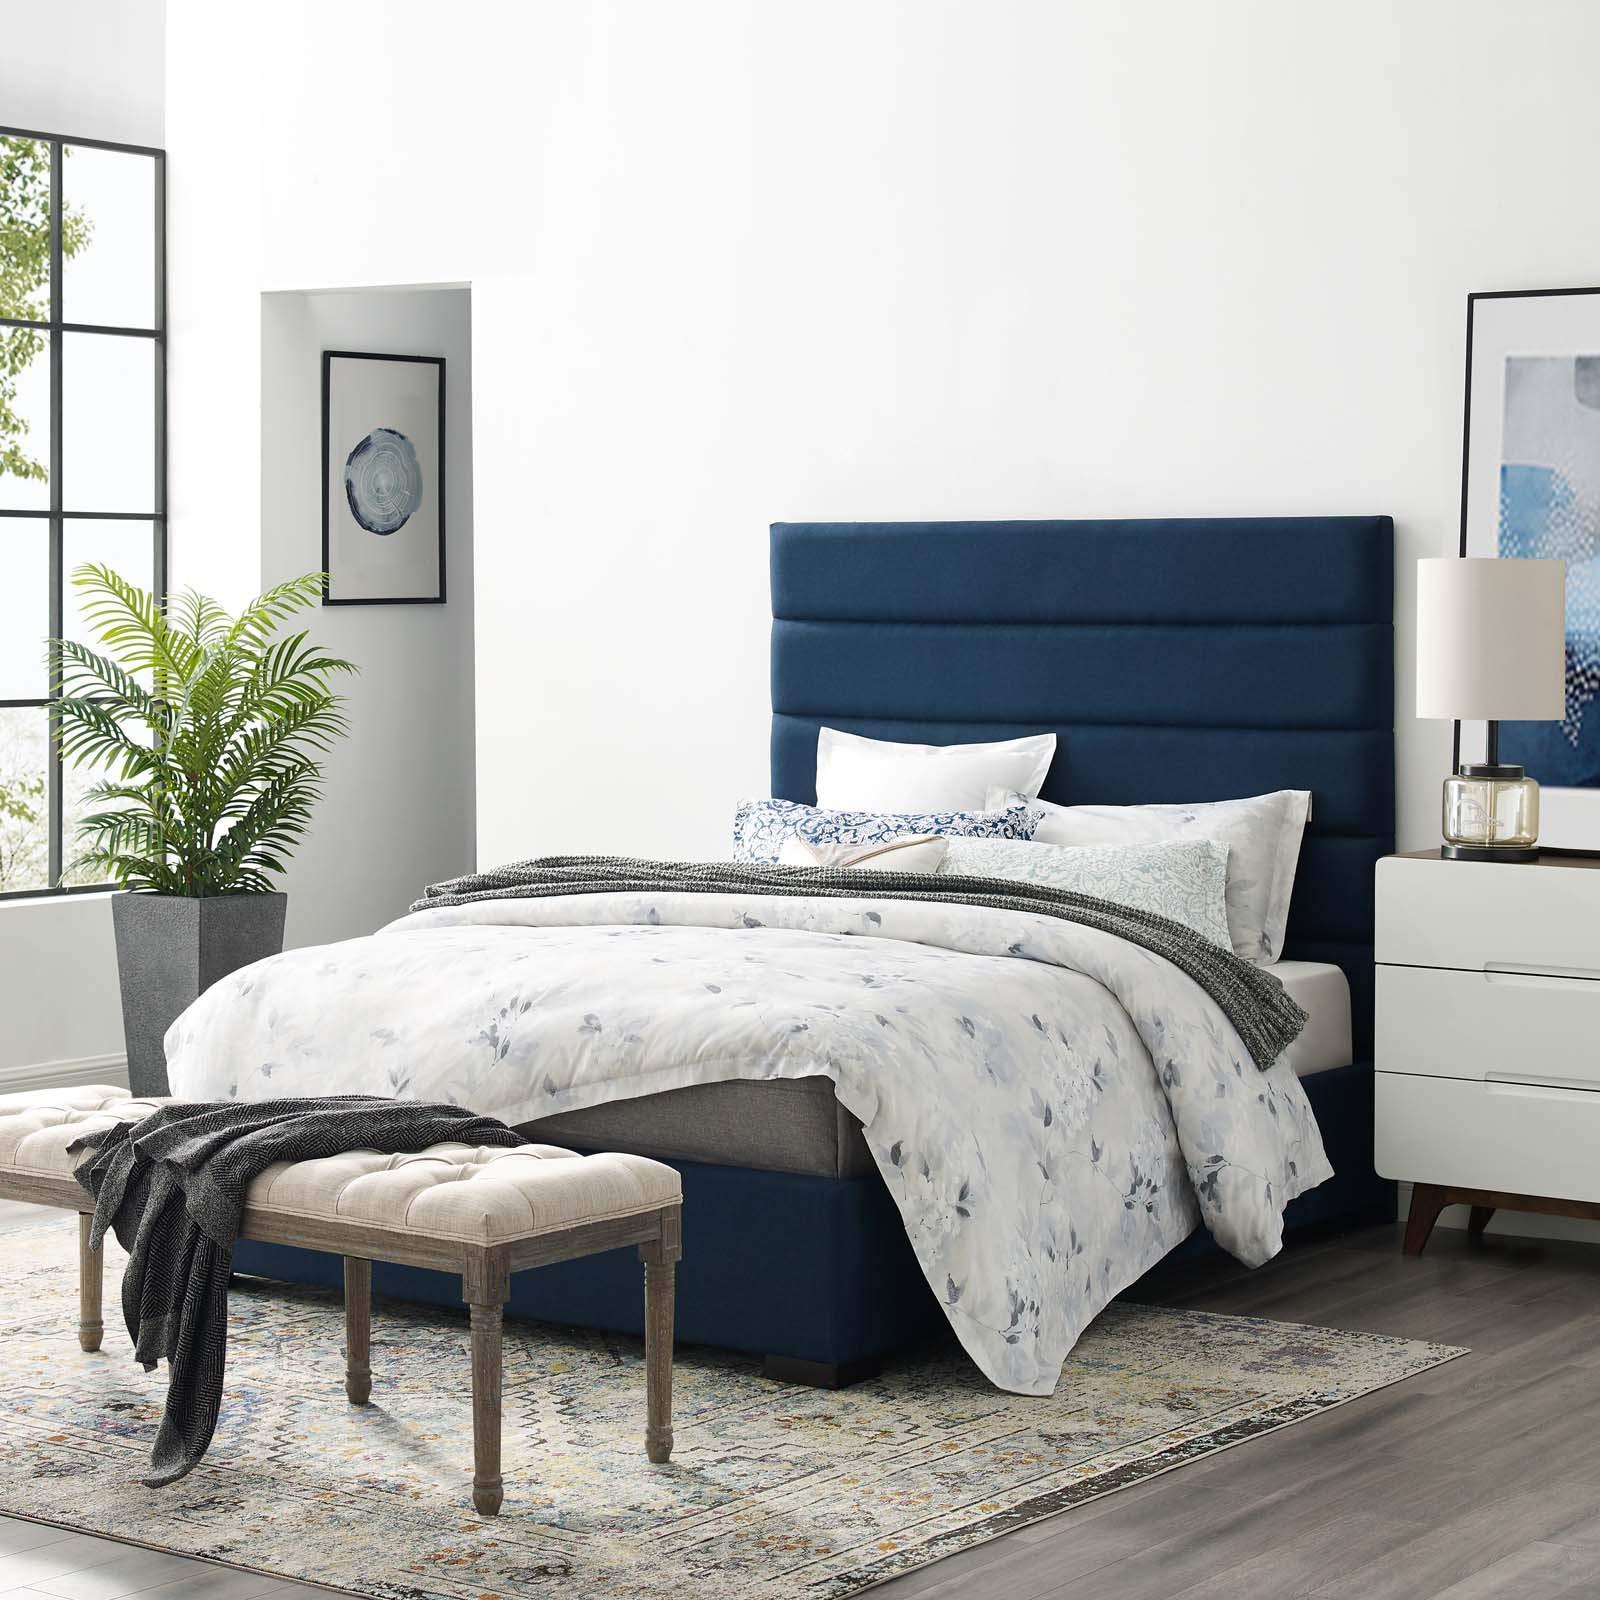 Modway MOD-6049-BLU Genevieve Queen Upholstered Fabric Platform Bed, Blue